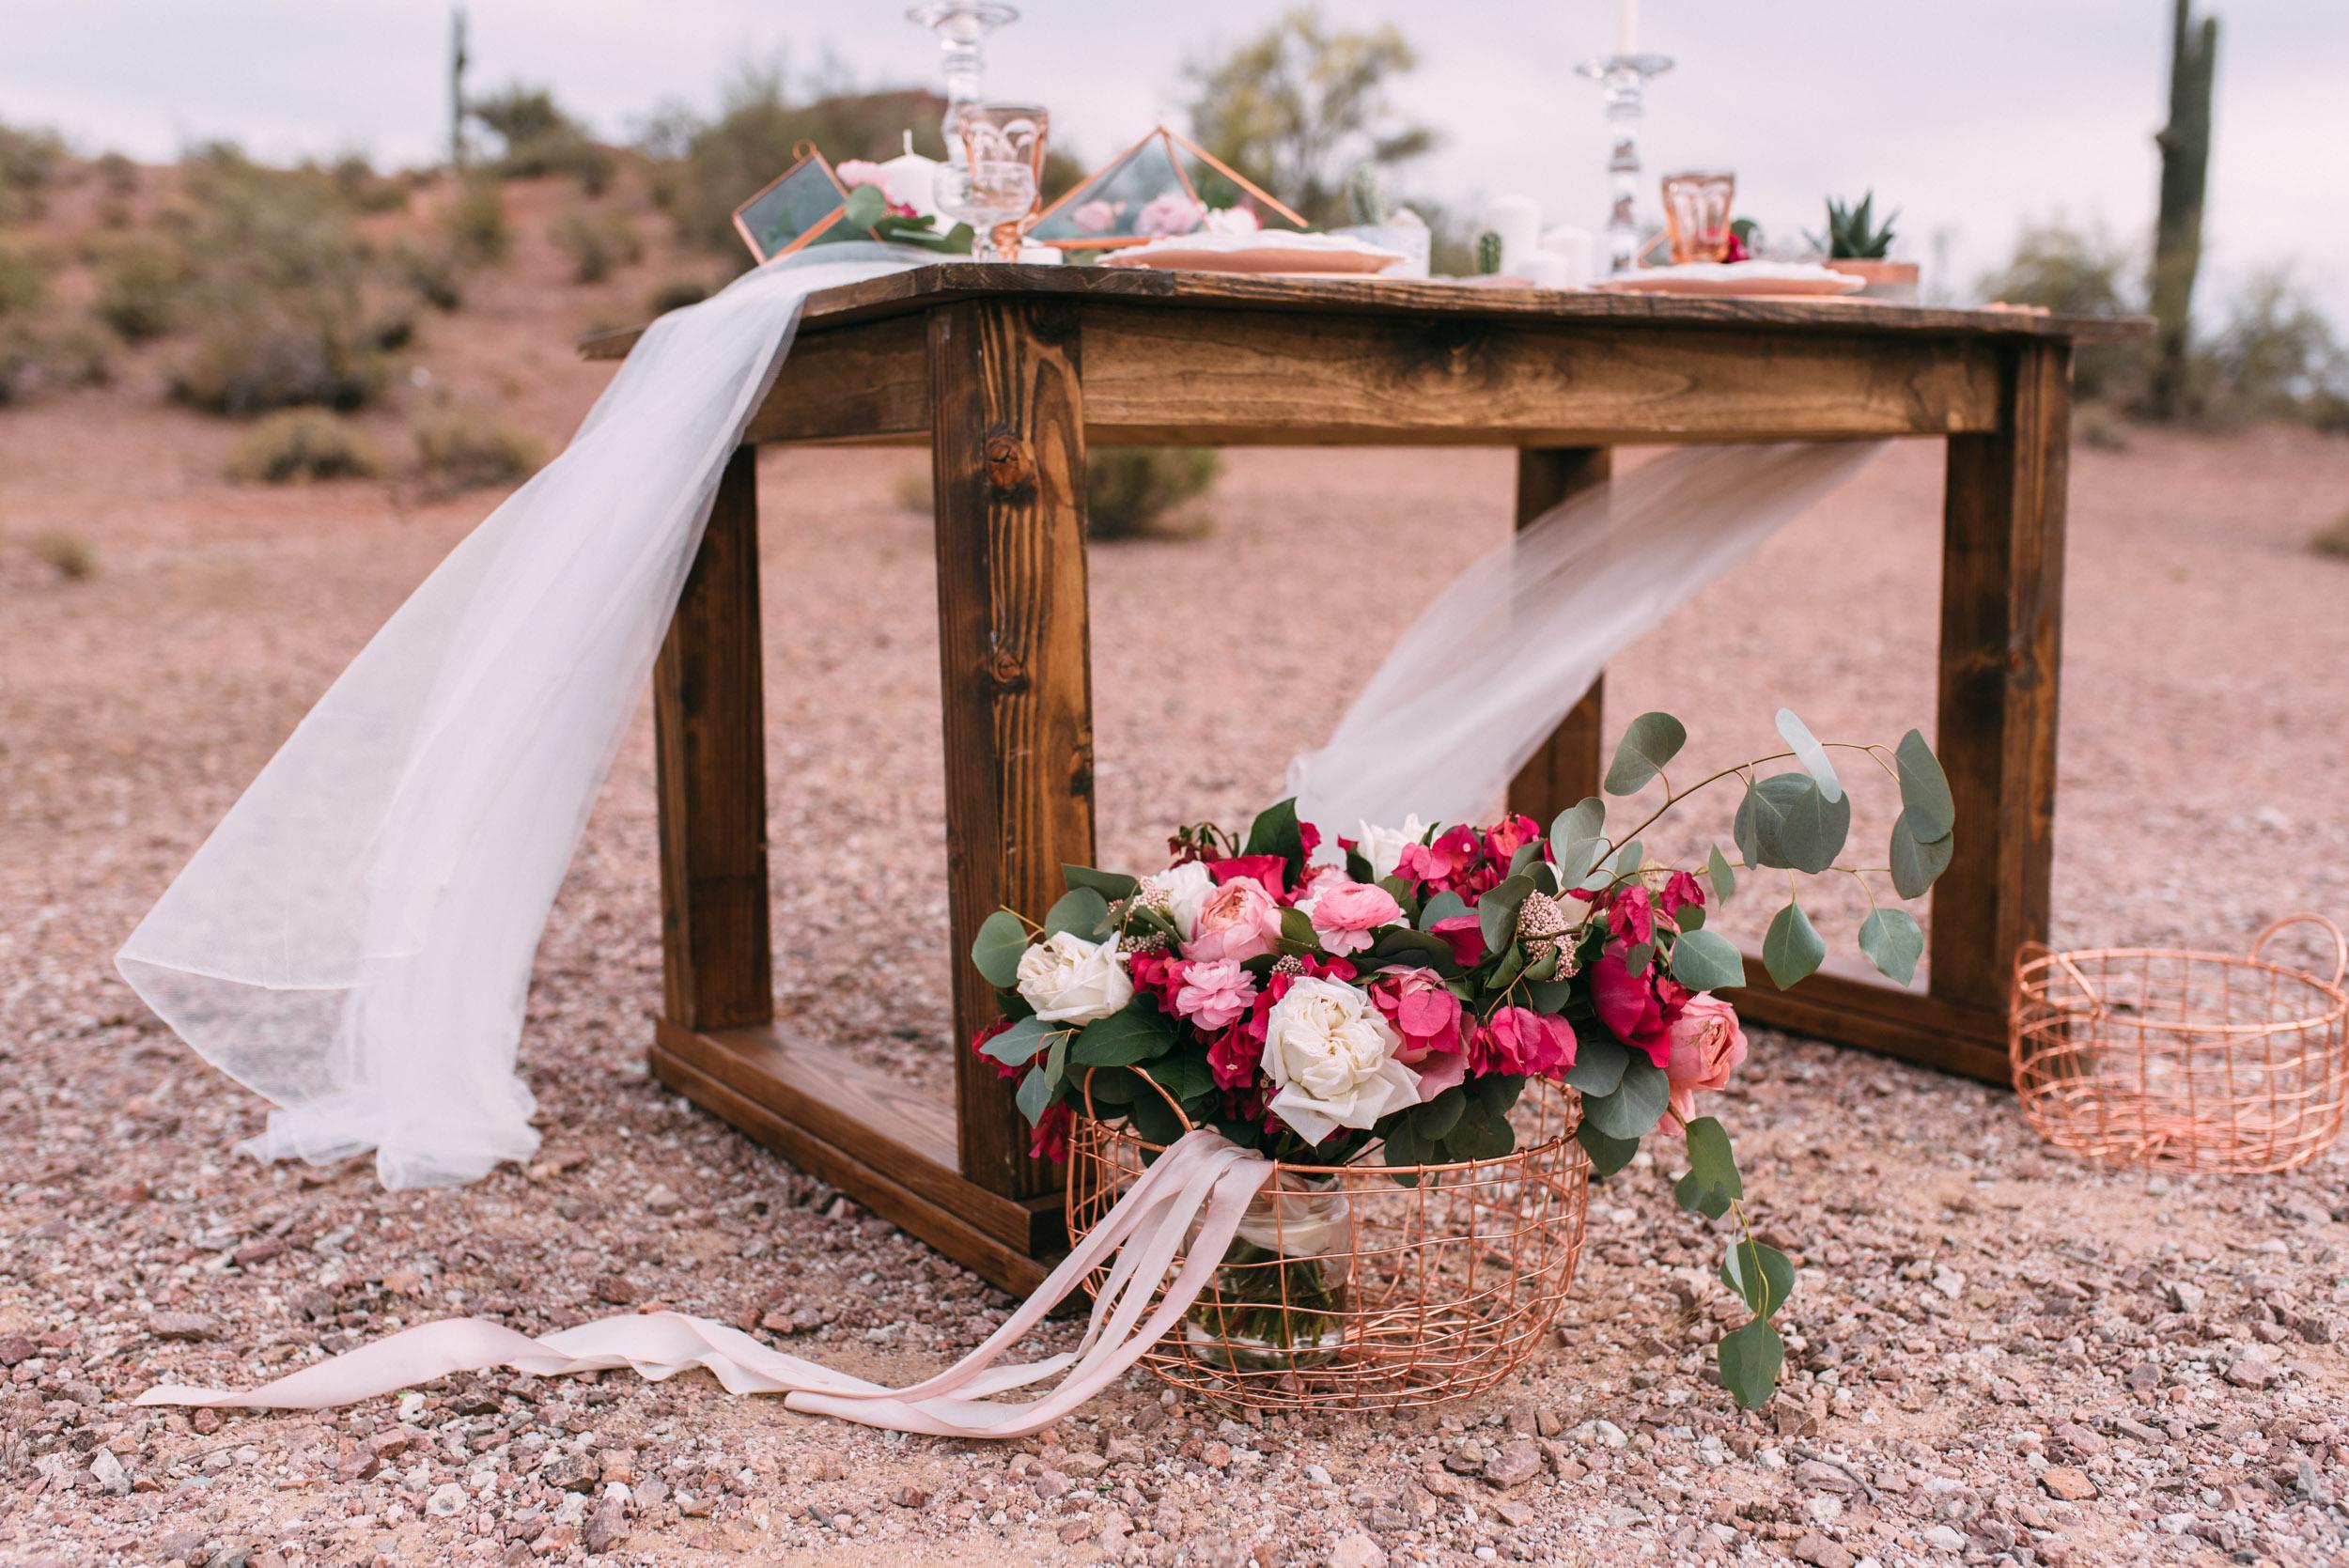 Rustic farm table with wedding bouquet in arizona